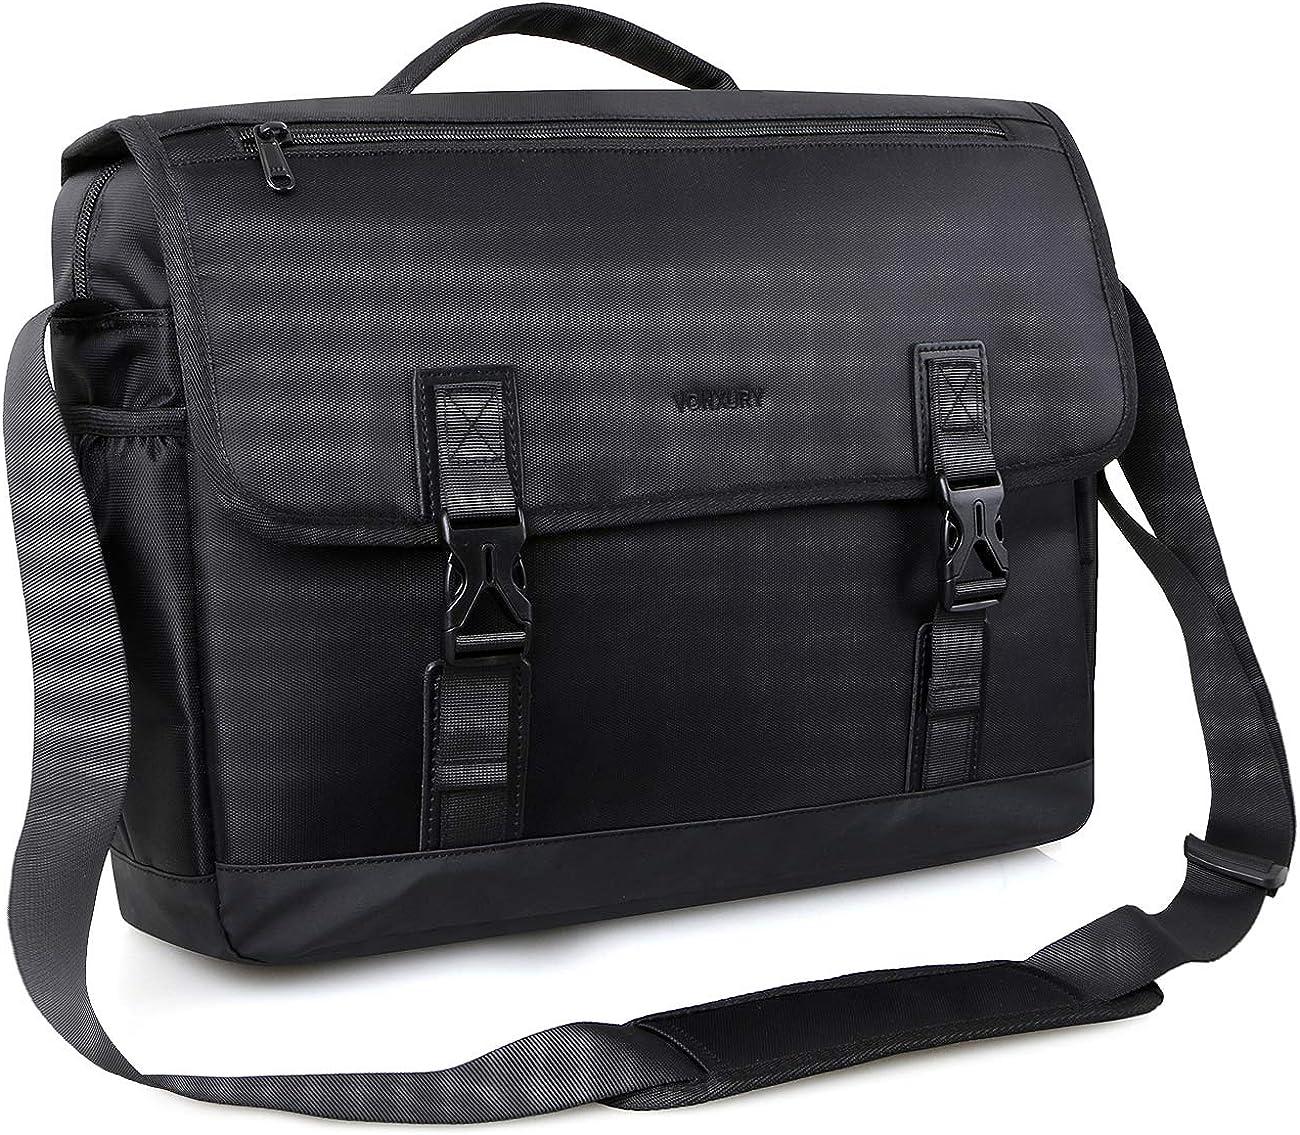 Messenger Max 82% OFF Bag For Men Max 77% OFF Water Ba Resistant Lightweight 15in Laptop